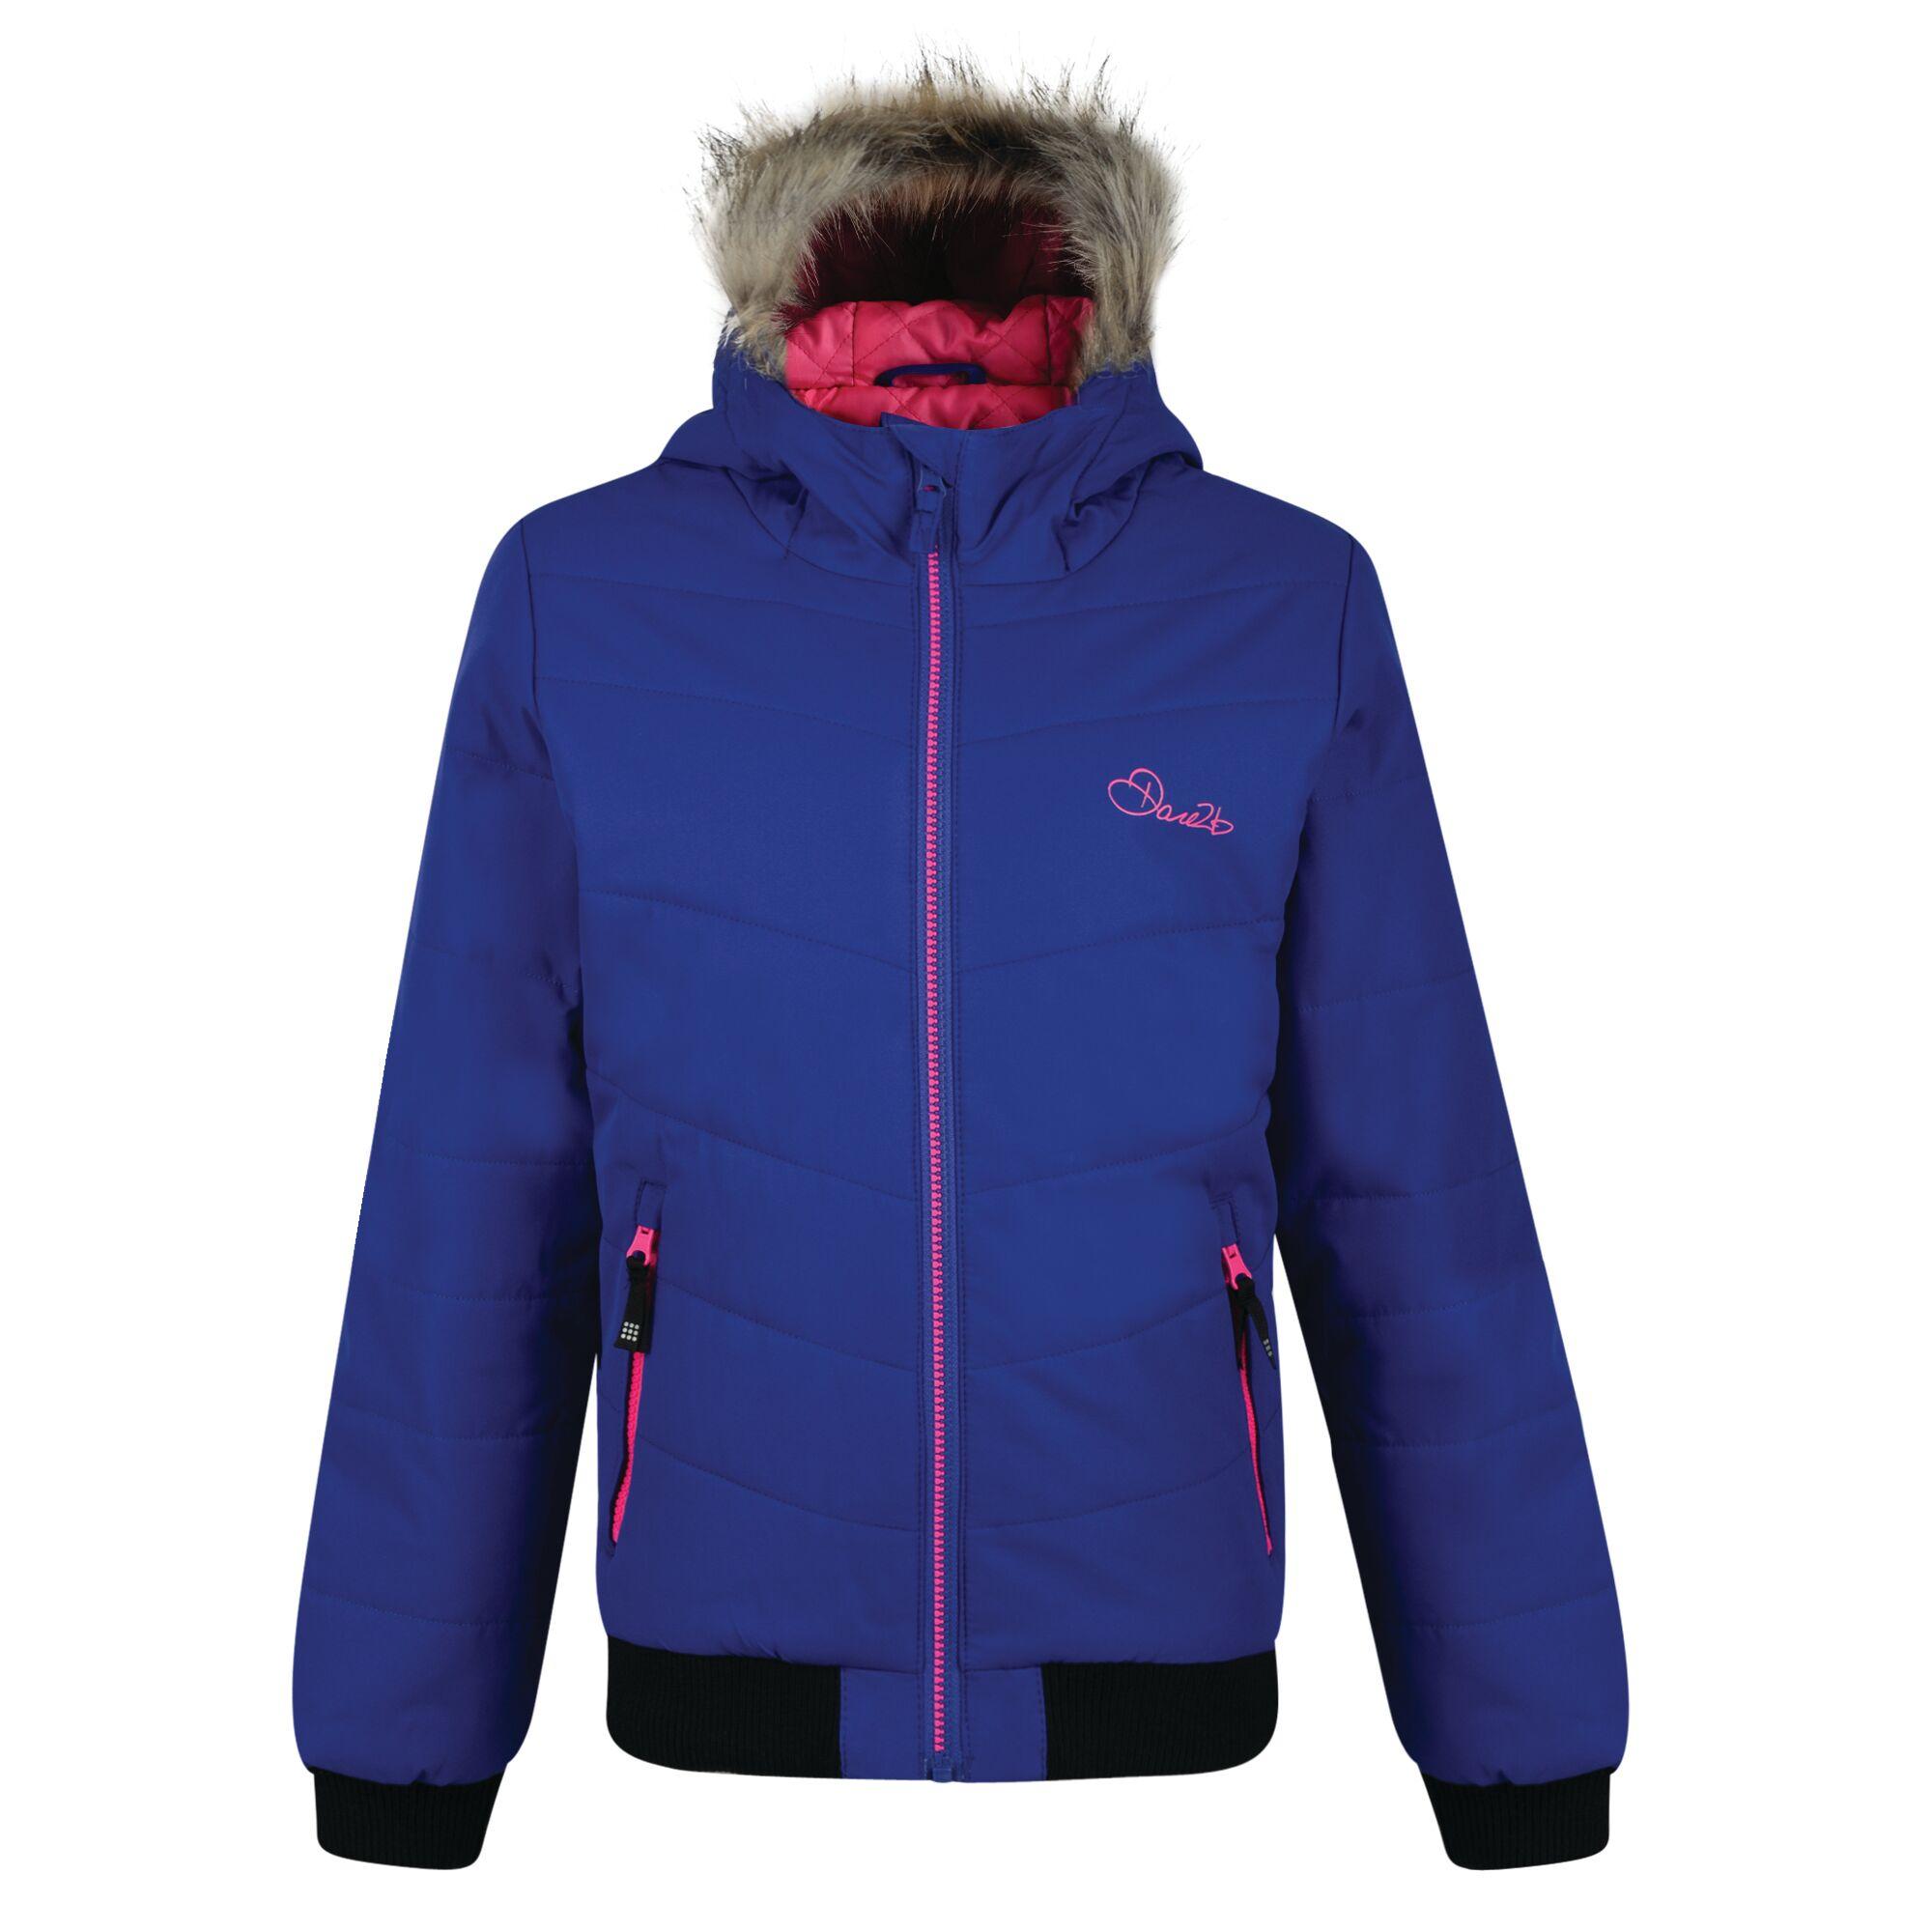 Dare 2b Childrens Girls Precocious Waterproof Insulated Jacket (9-10 UK) (Clematis)